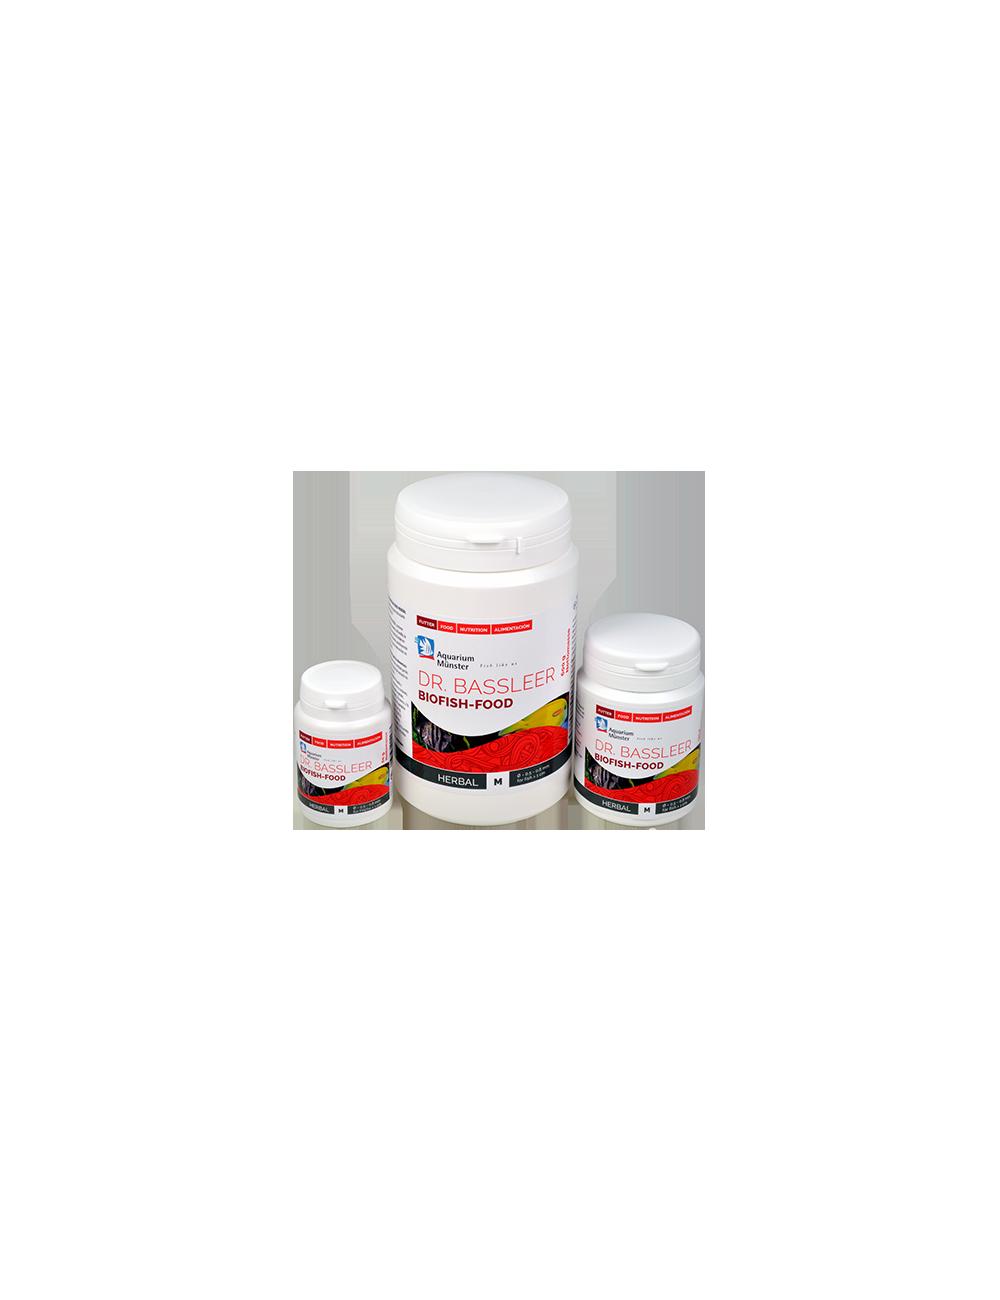 DR. BASSLEER - Biofish food herbal 60g - Nourriture naturelle pour poissons - M